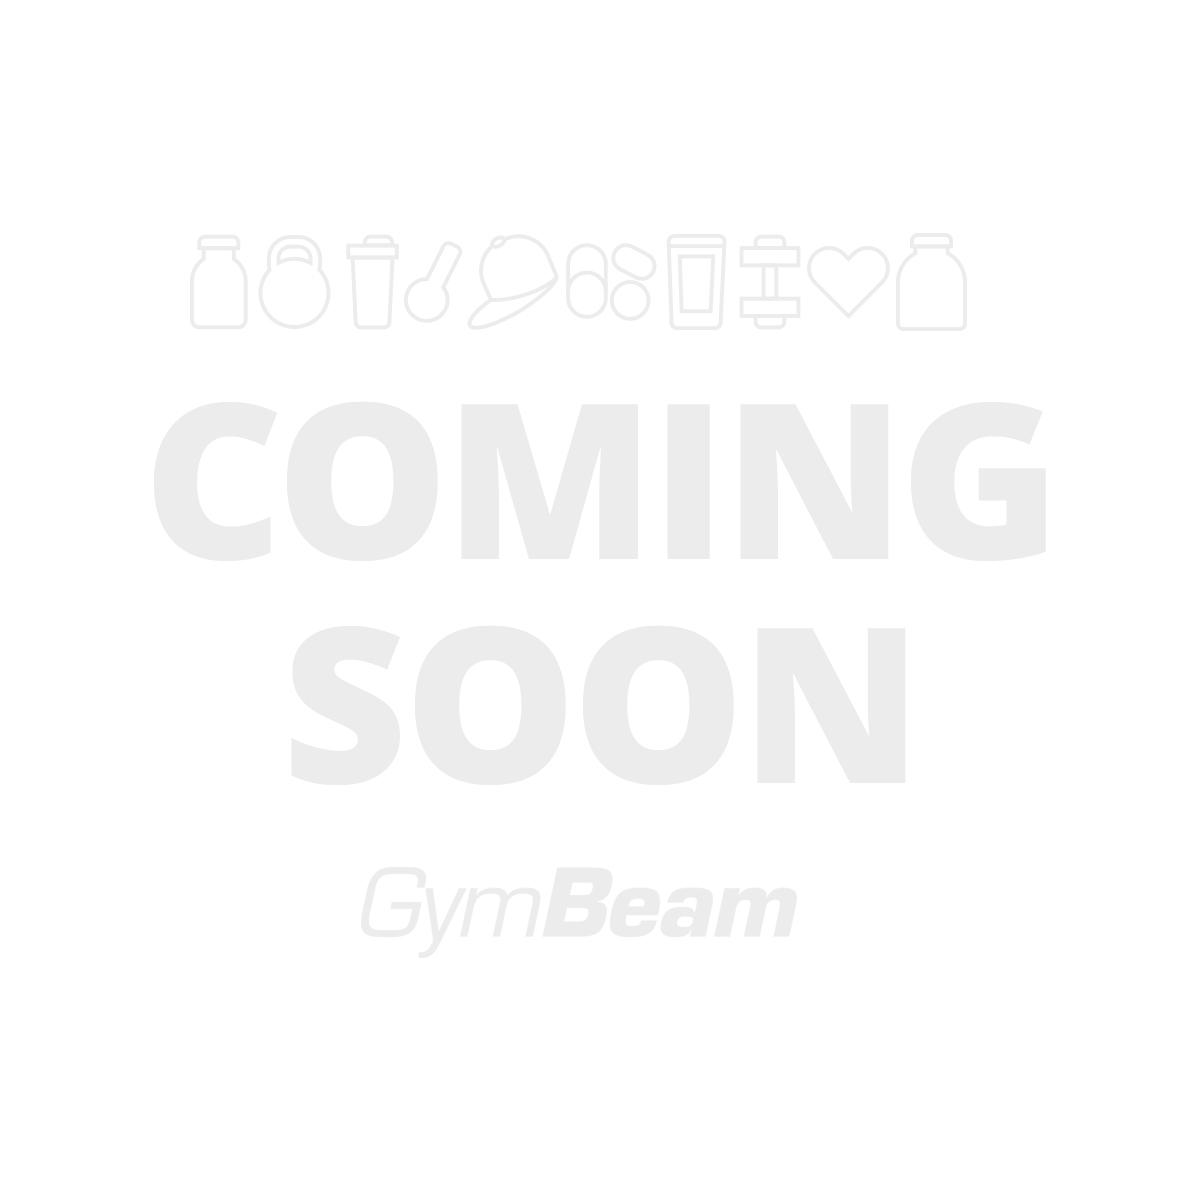 A String Bag Turquoise táska - BeastPink